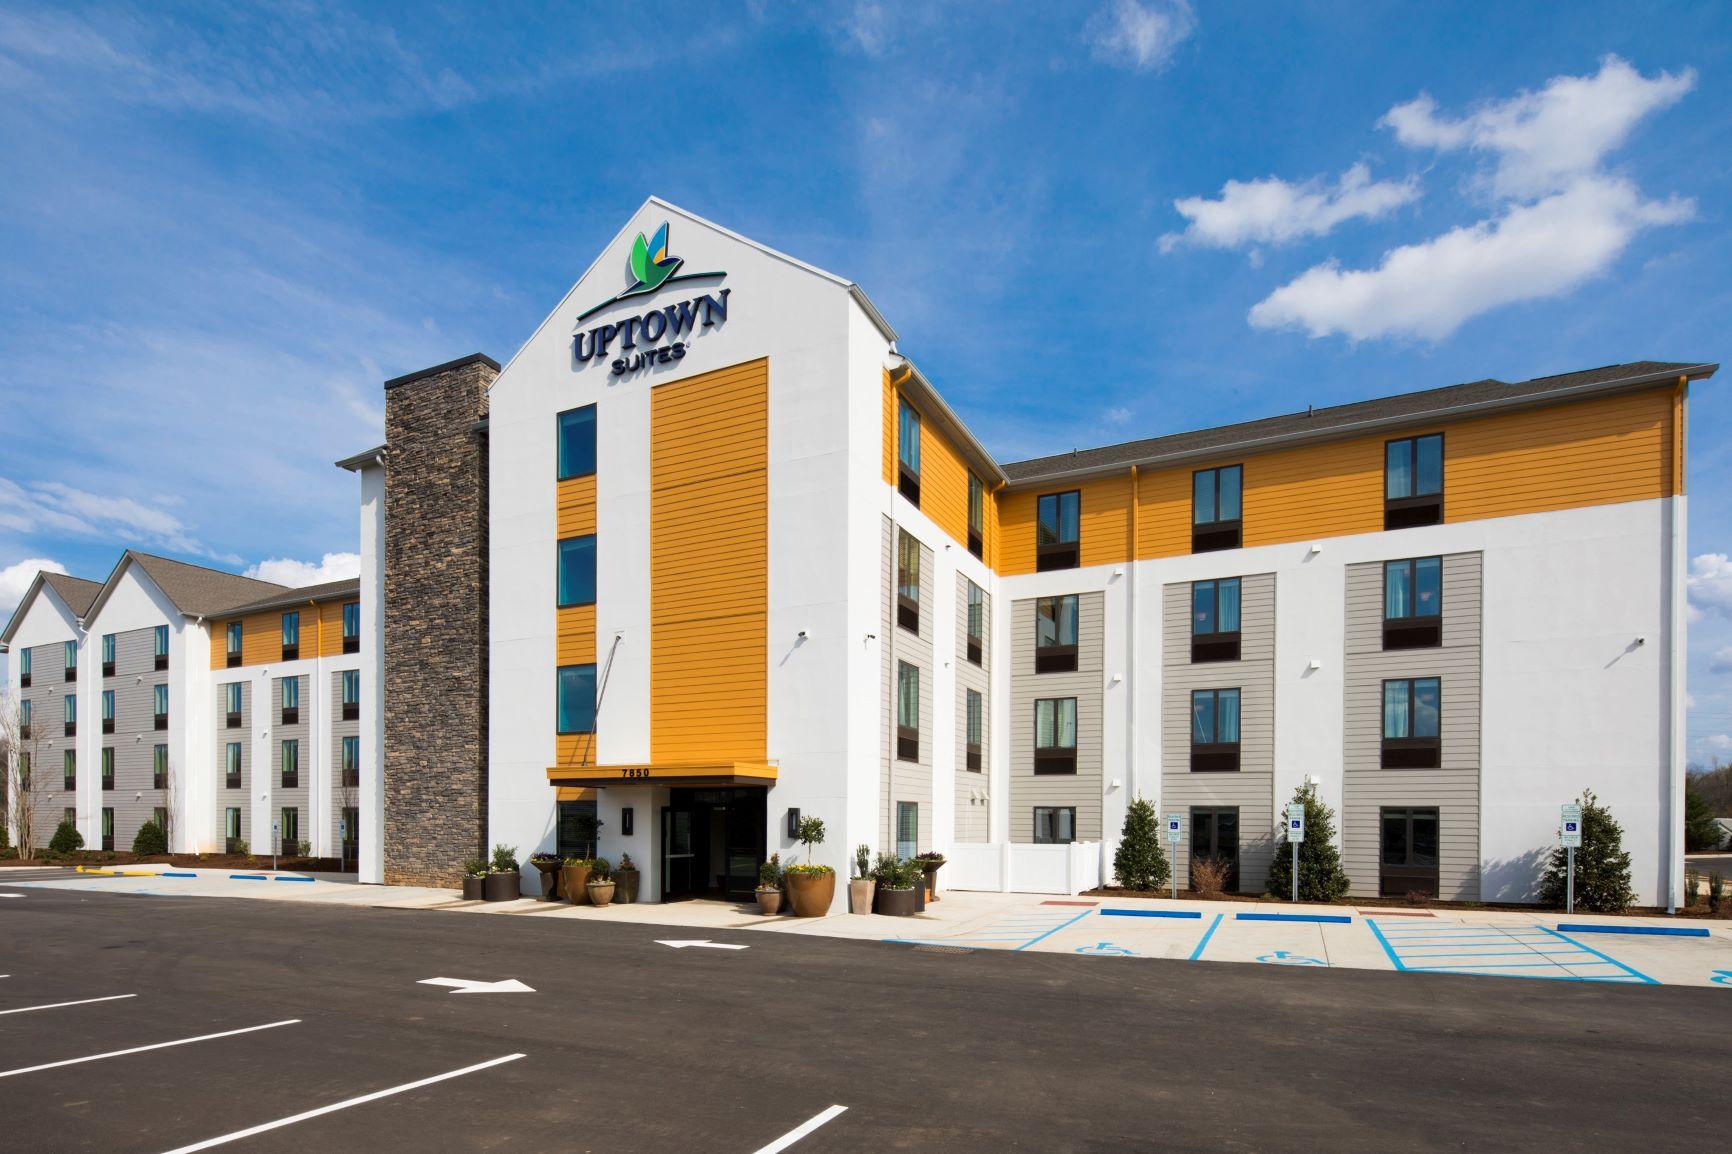 Uptown Suites Extended Stay Denver/Westminster